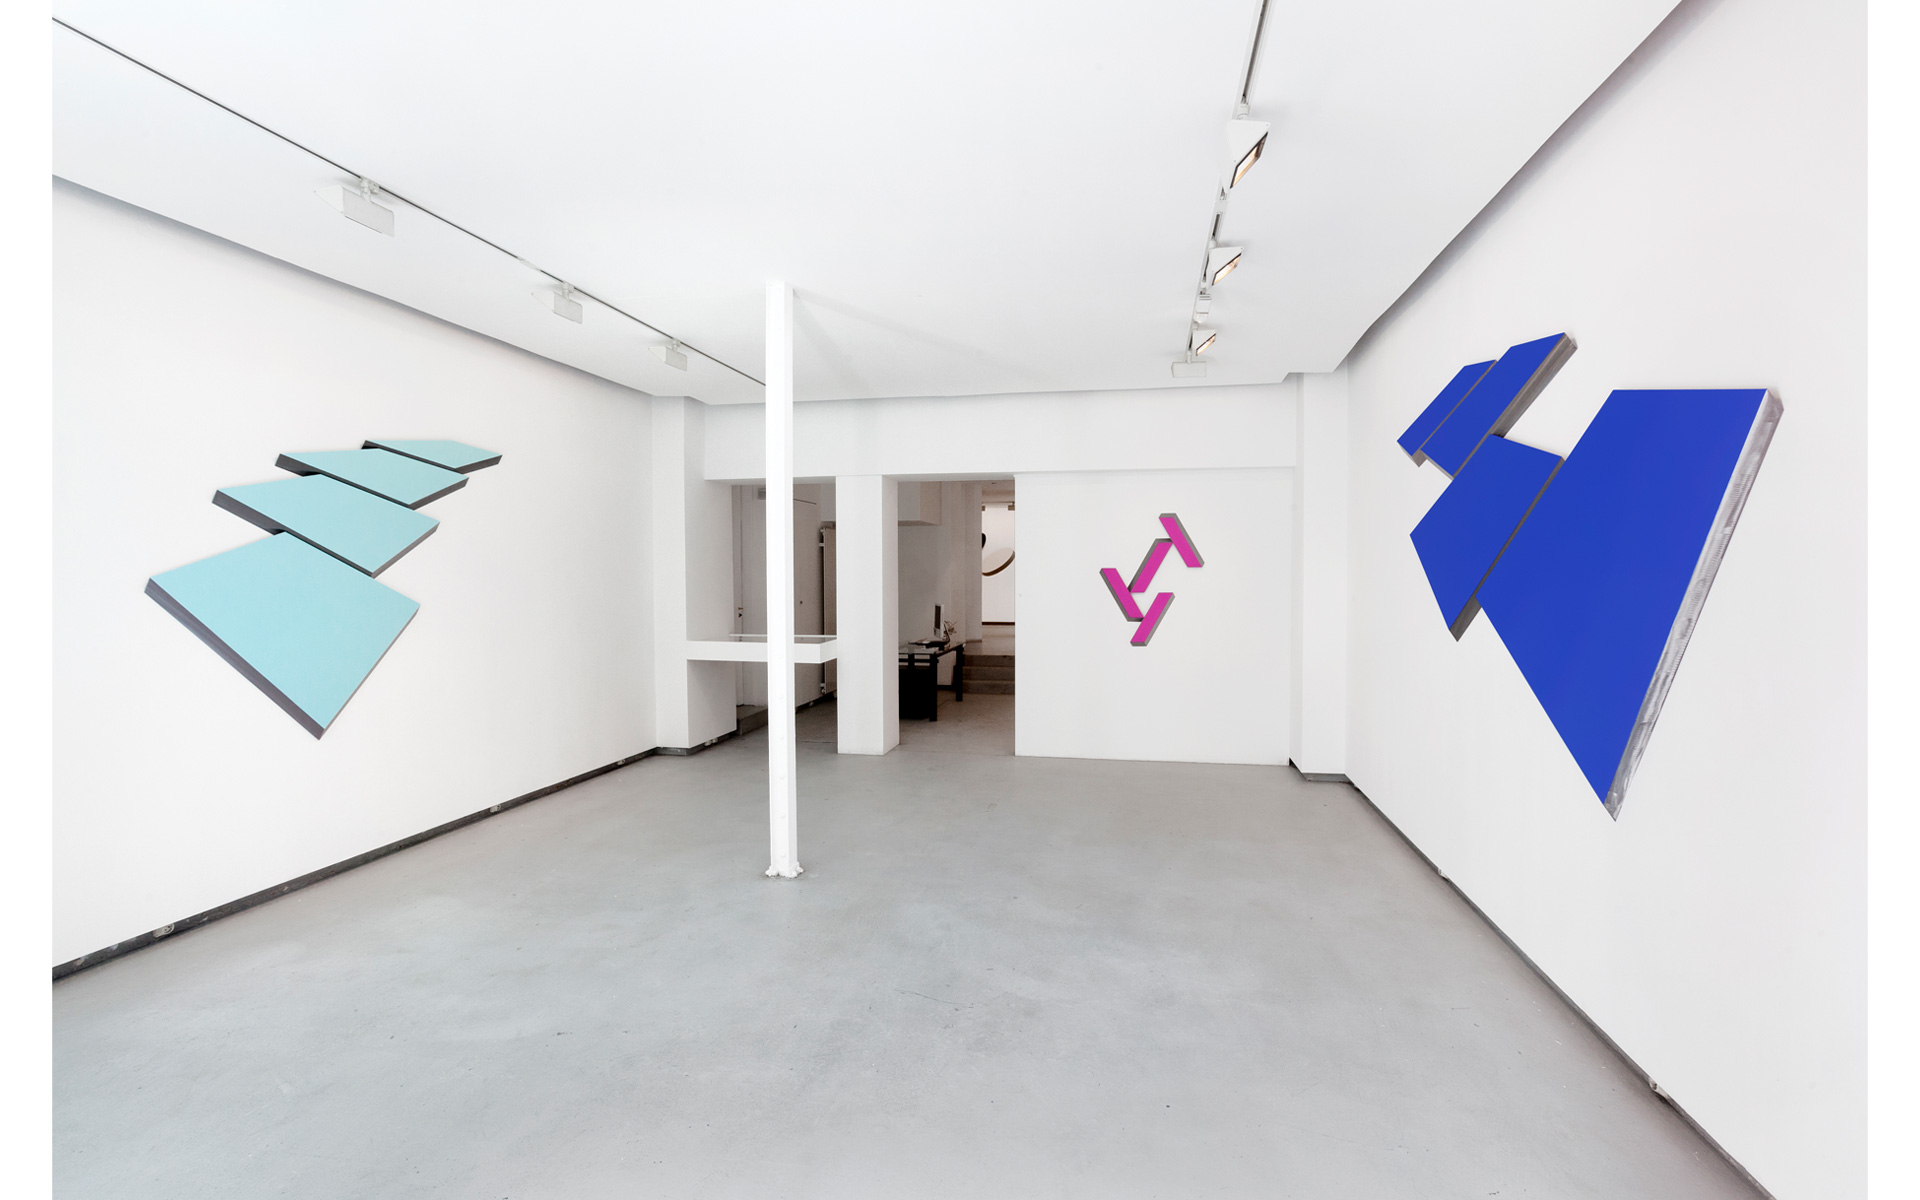 Installation view Gallery Denise René, Paris, 2014